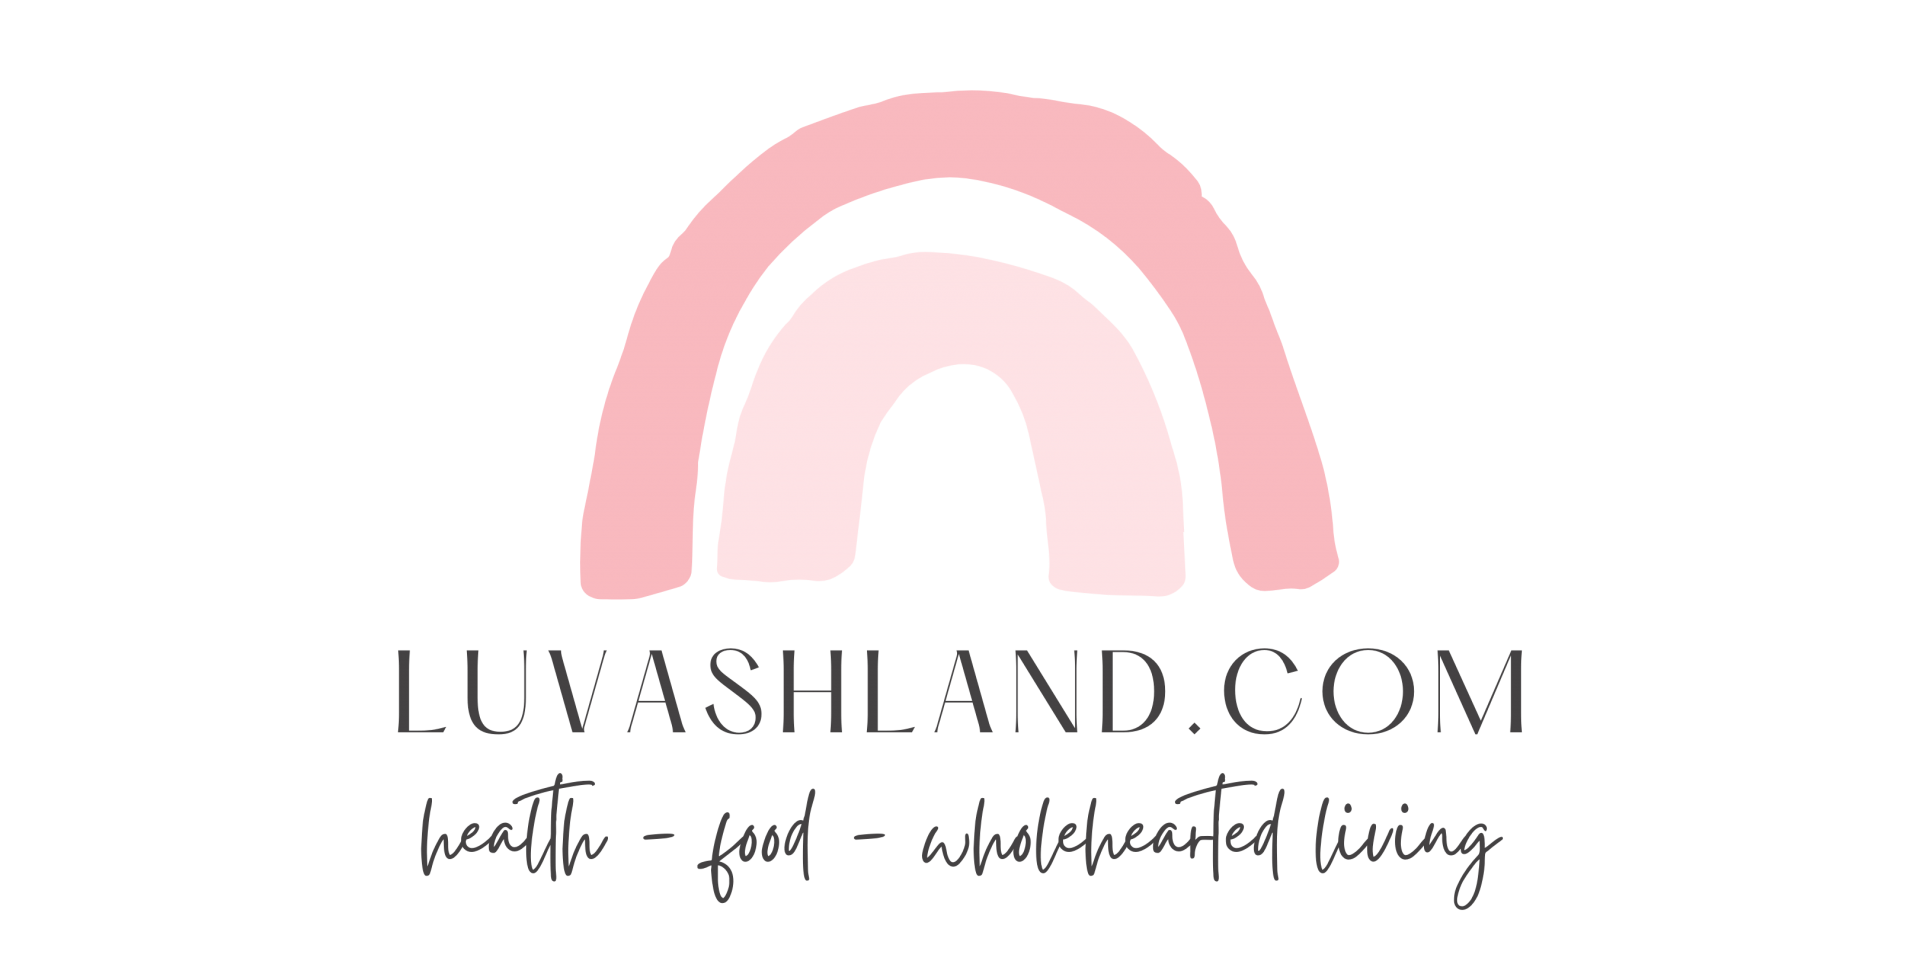 LuvAshland – Health, Food & Wholehearted Living